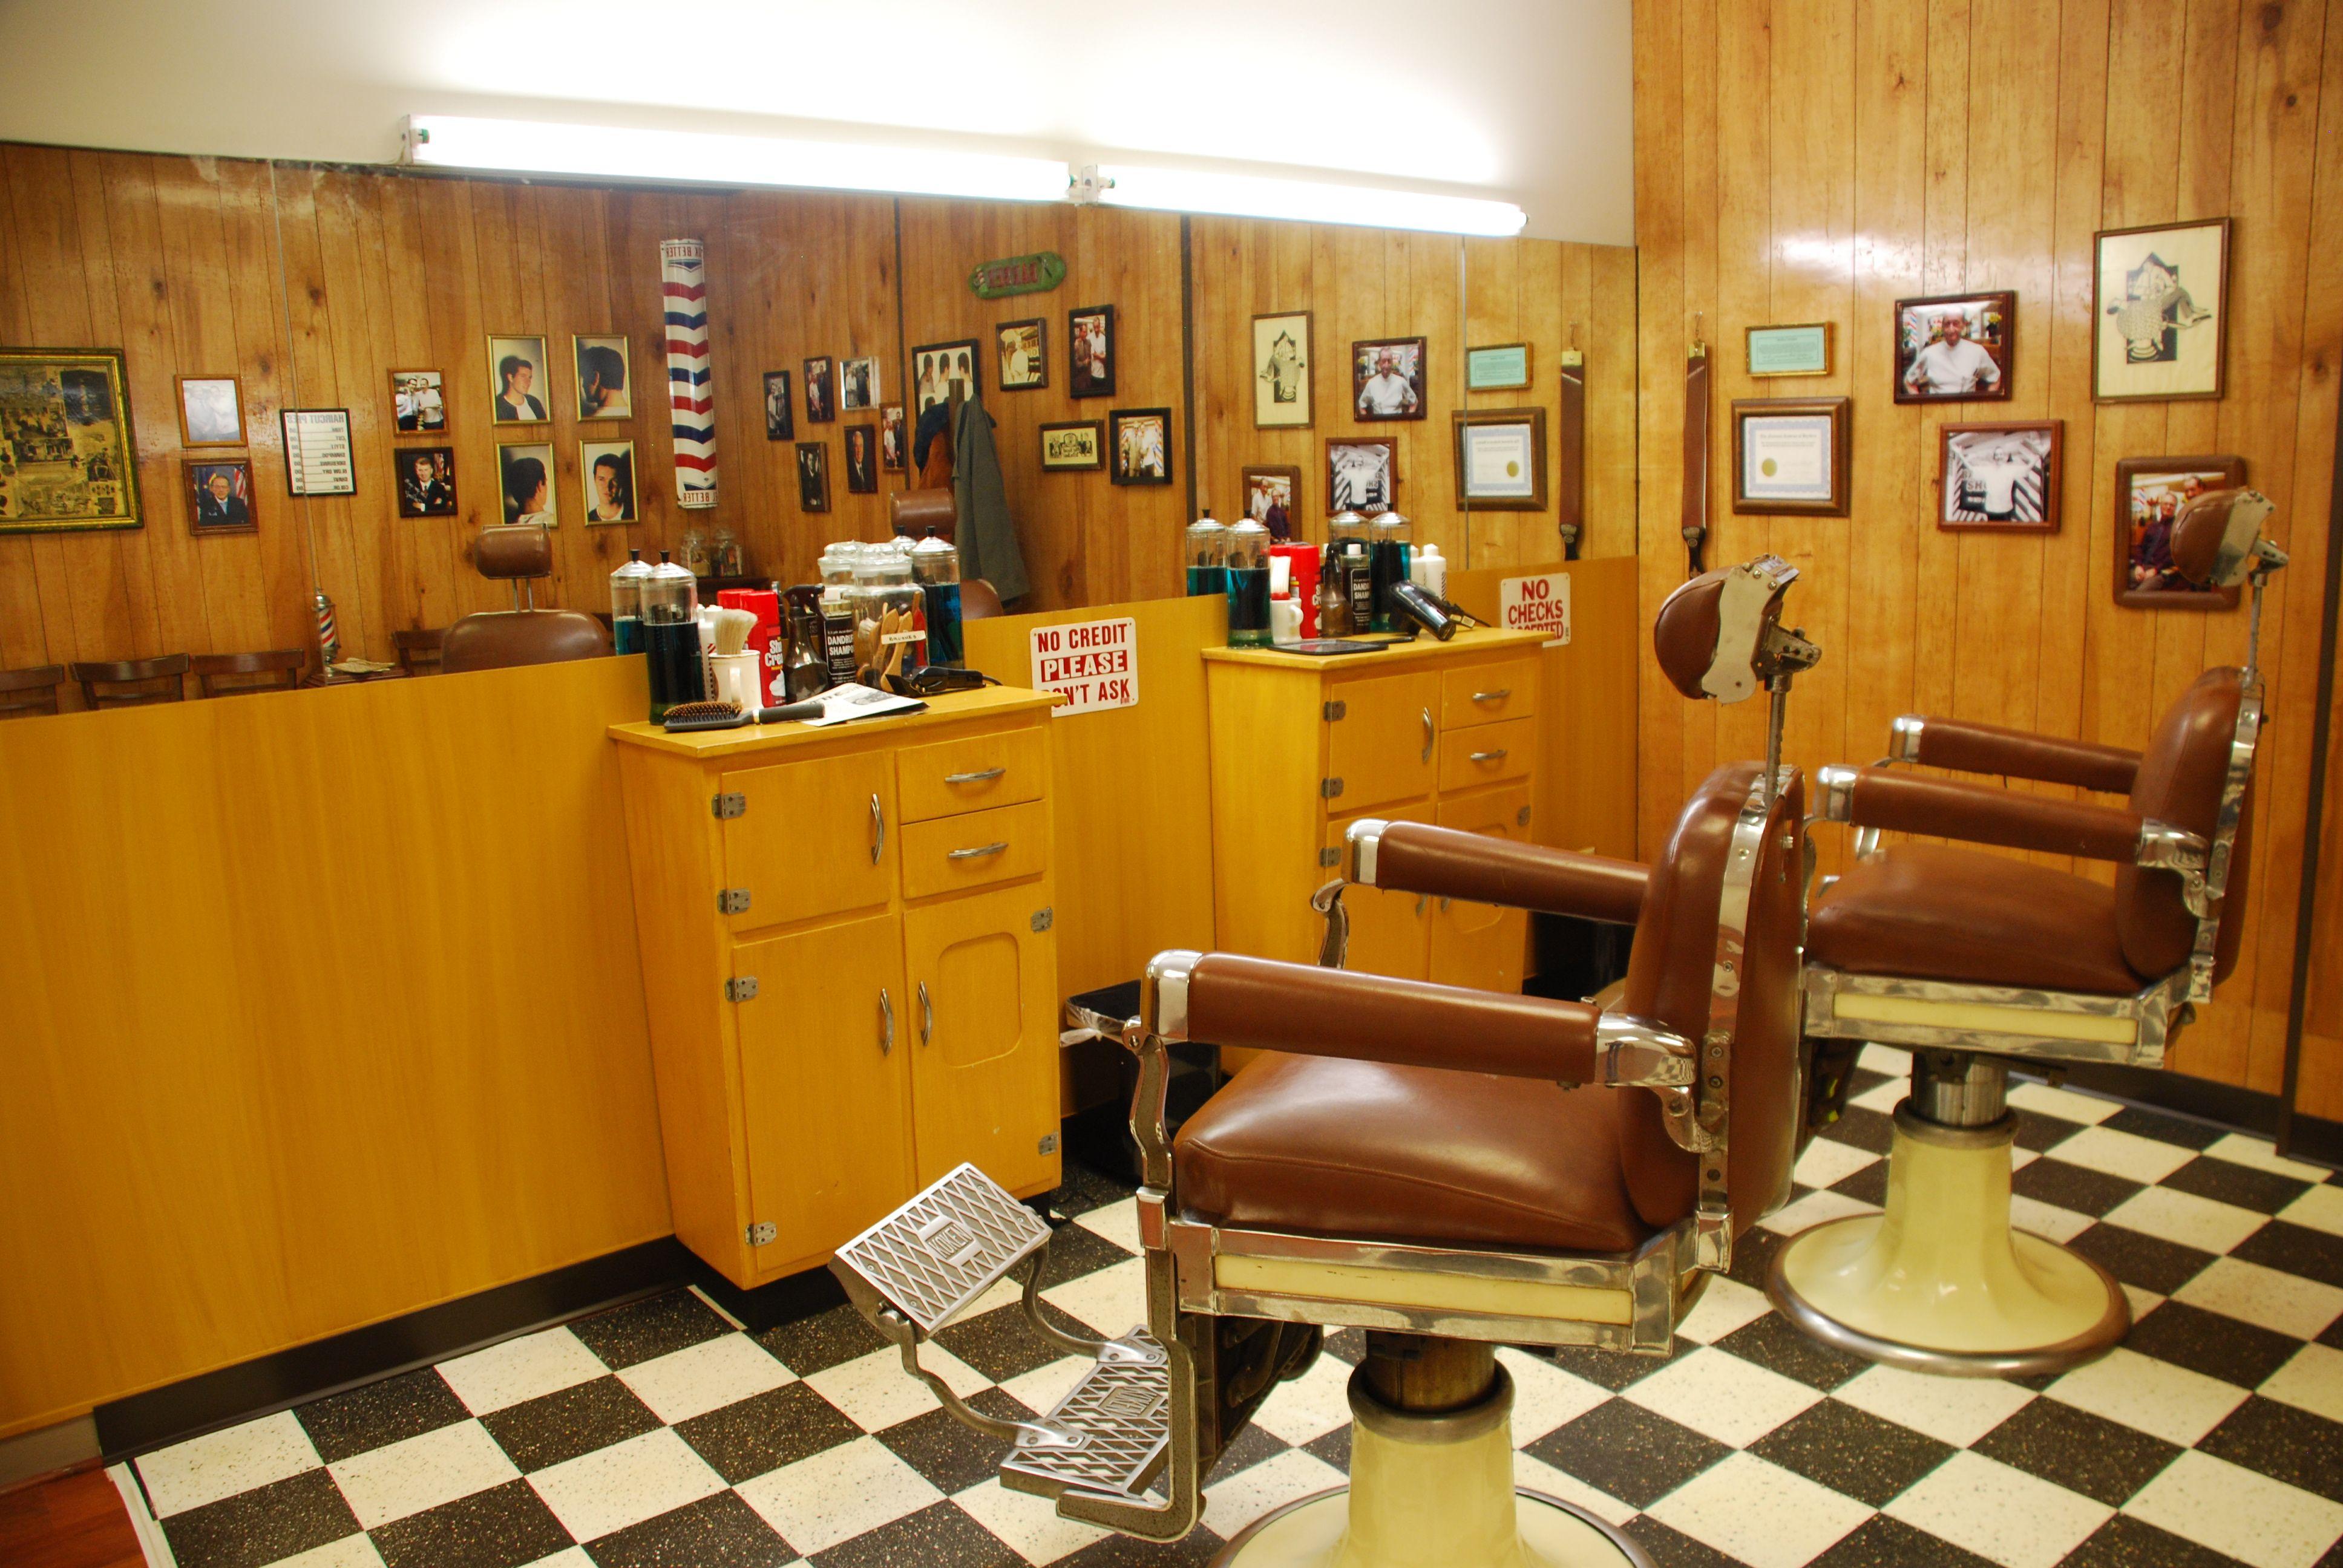 Barber Shop.JPG (3872×2592)